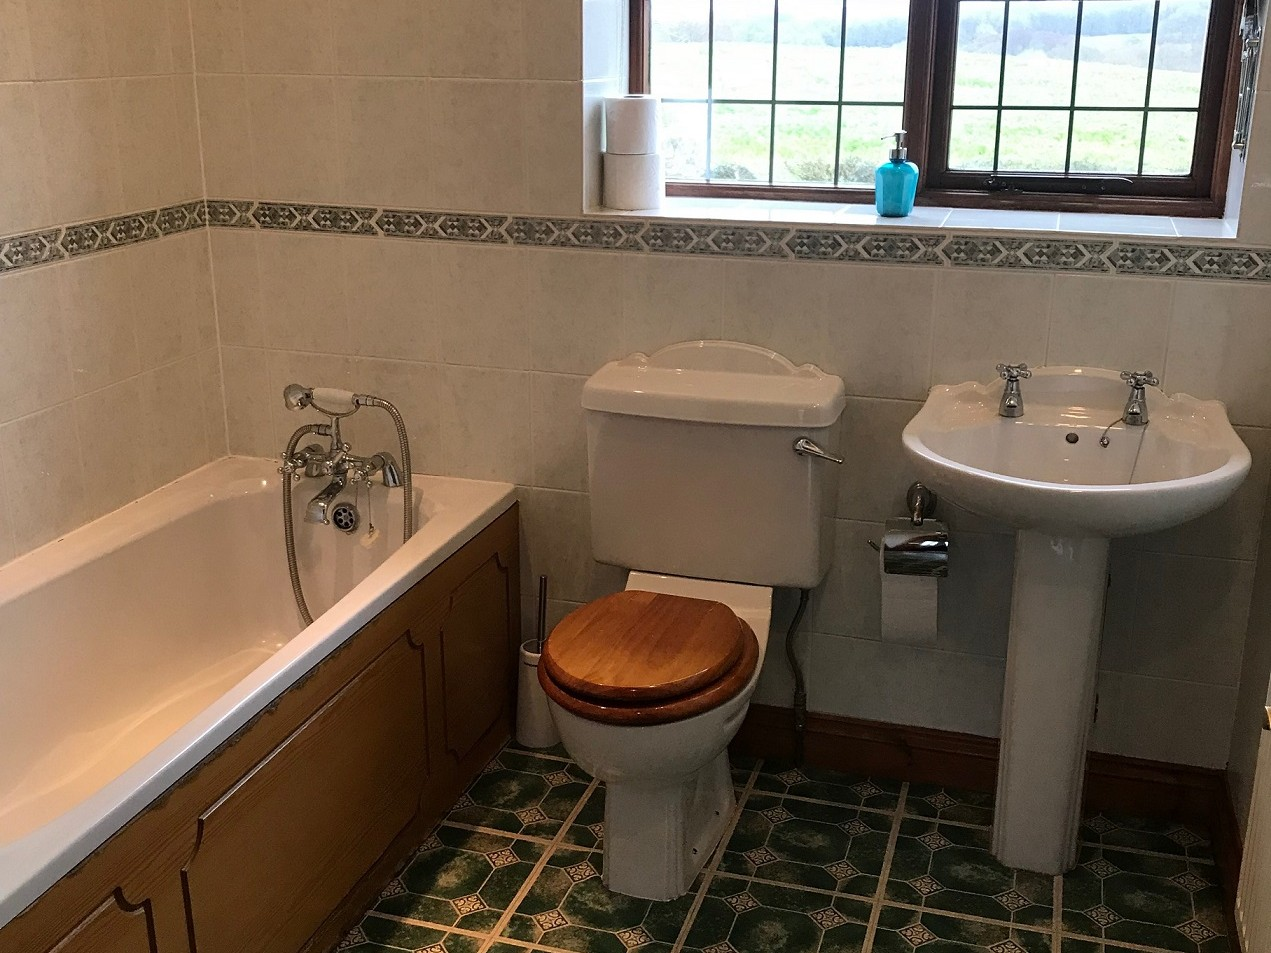 Mounts View bathroom